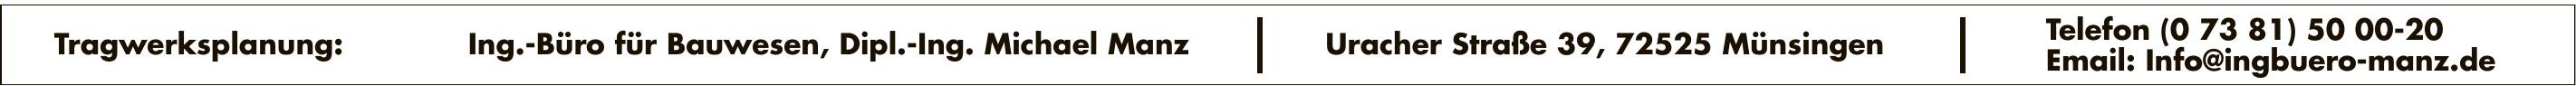 Ing.-Büro für Bauwesen, Dipl.-Ing. Michael Manz